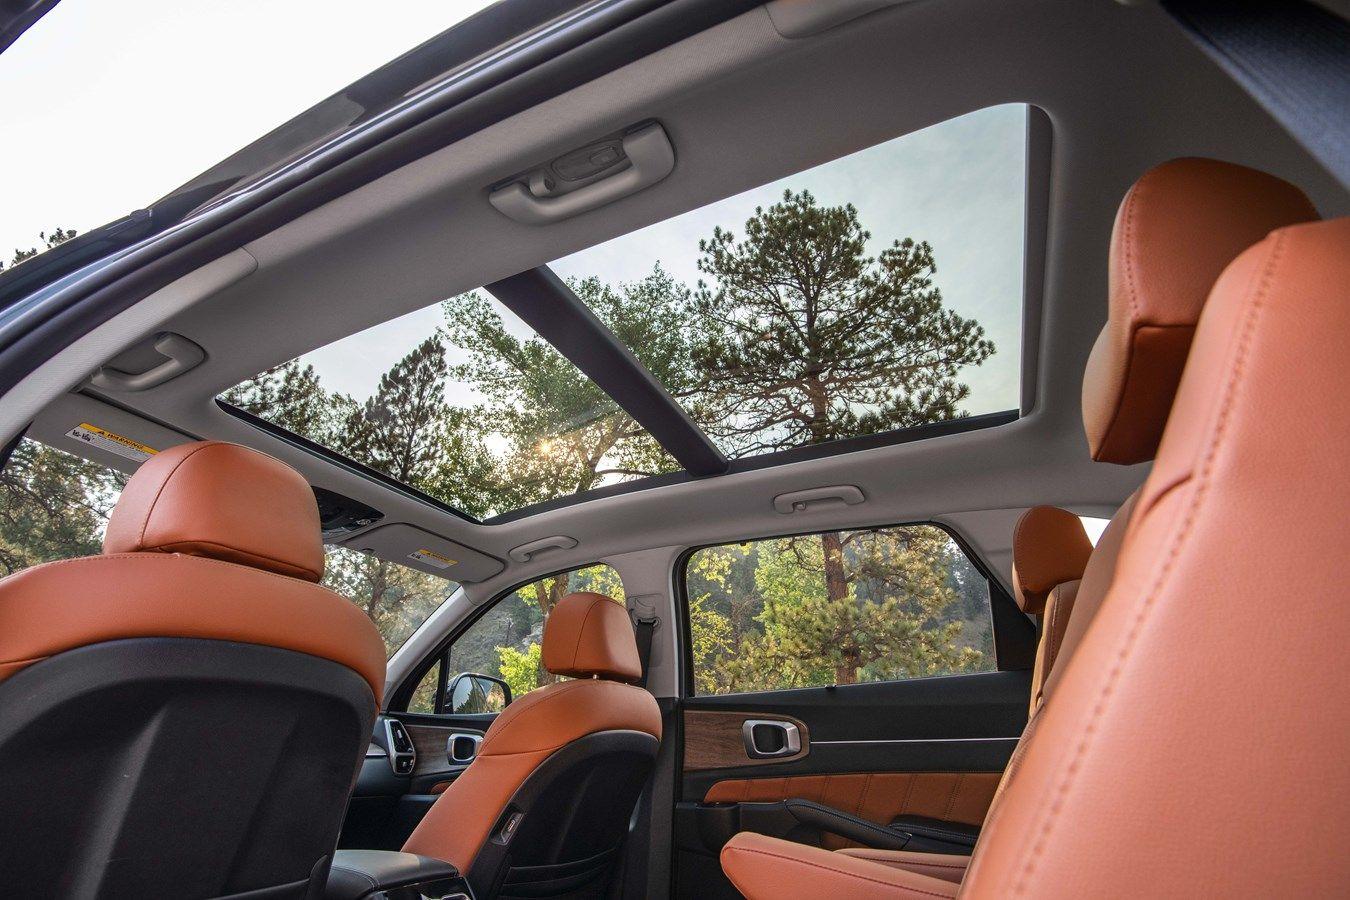 2021 Kia Sorento Hybrid Preview- Expected Release Date ...